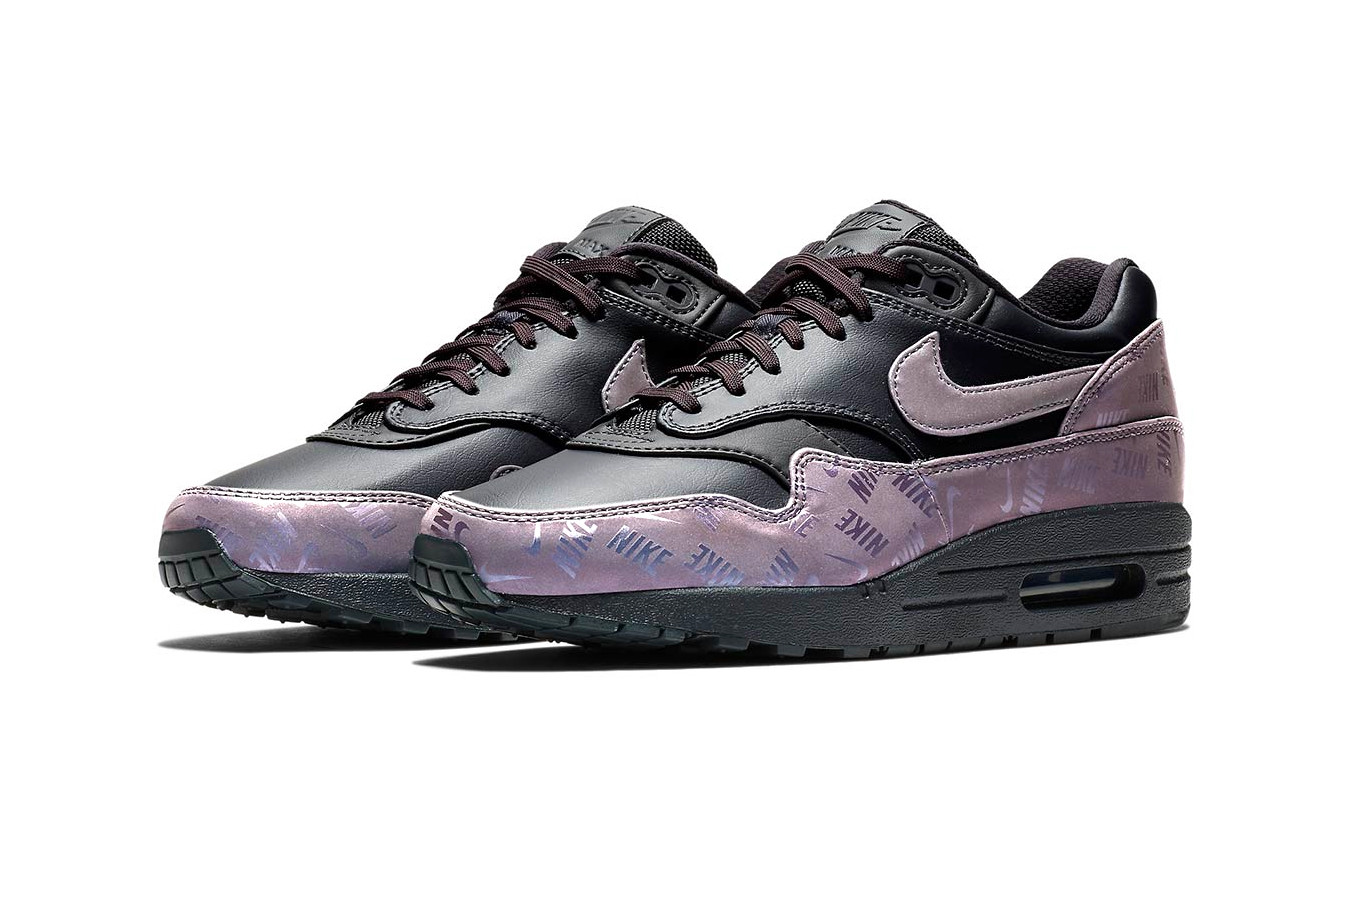 Nike Air Max 1 Black \u0026 Iridescent